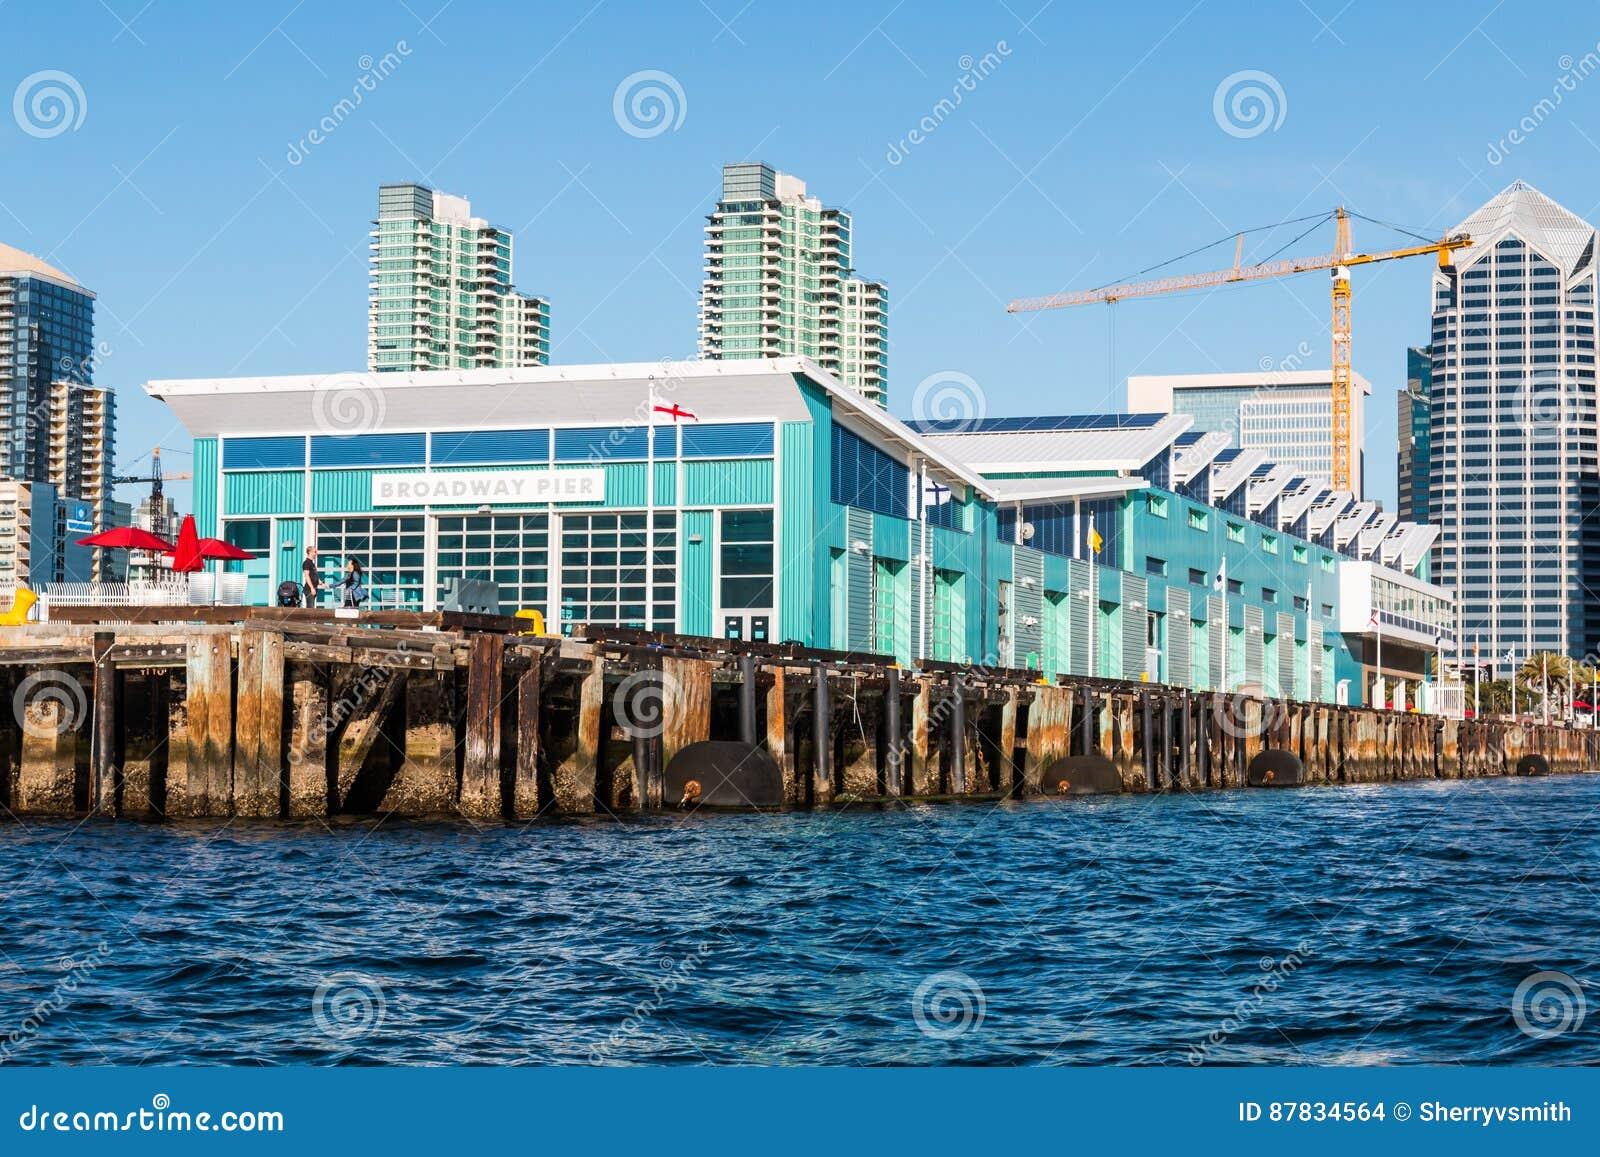 Cruise Ship Terminal On Embarcadero In San Diego Editorial Stock